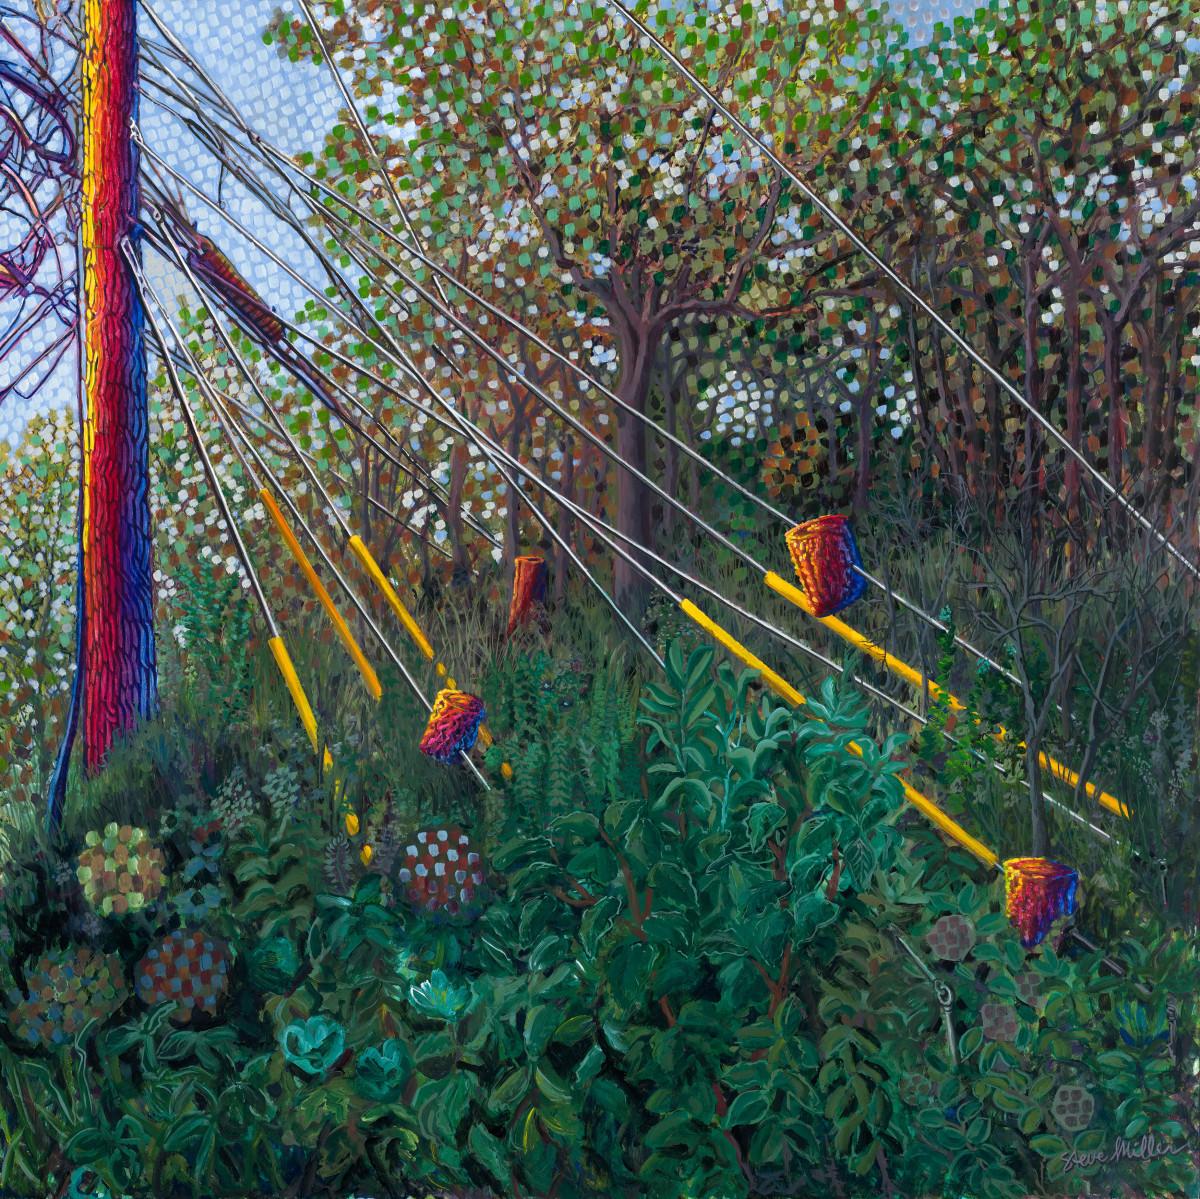 Unexpected Garden by Steve Miller